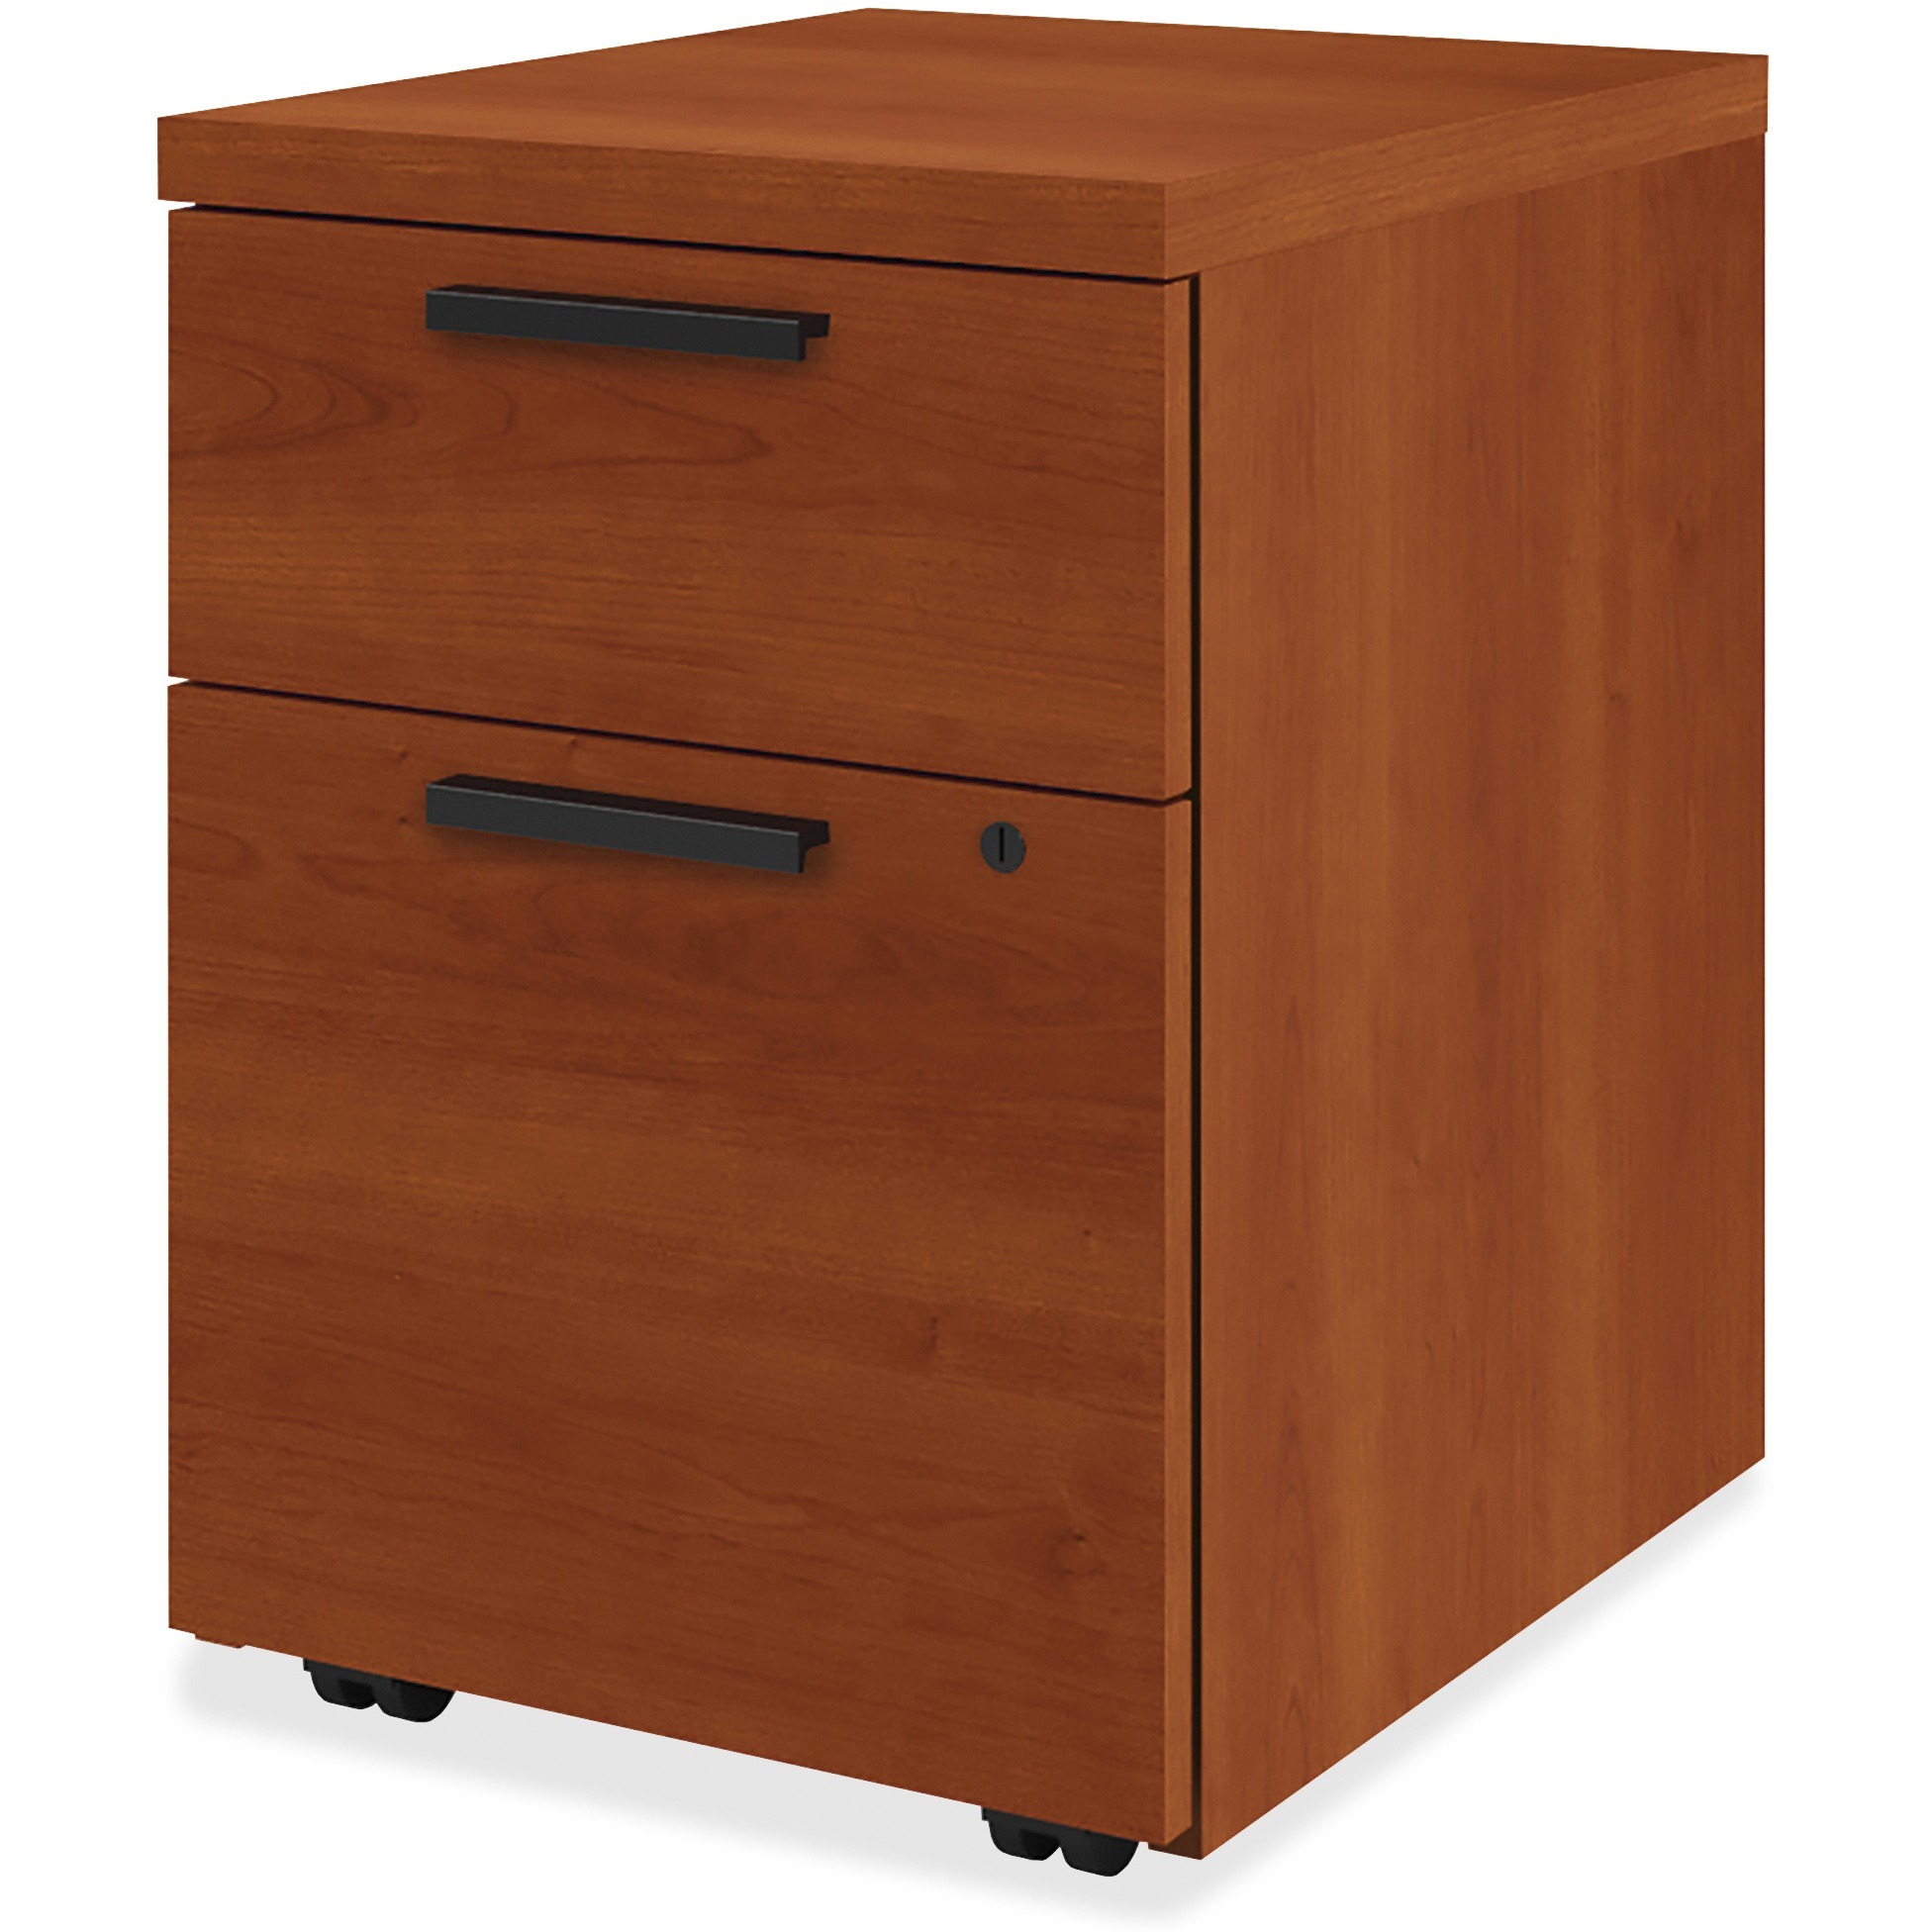 HON 2 Drawers Vertical Lockable Filing Cabinet,